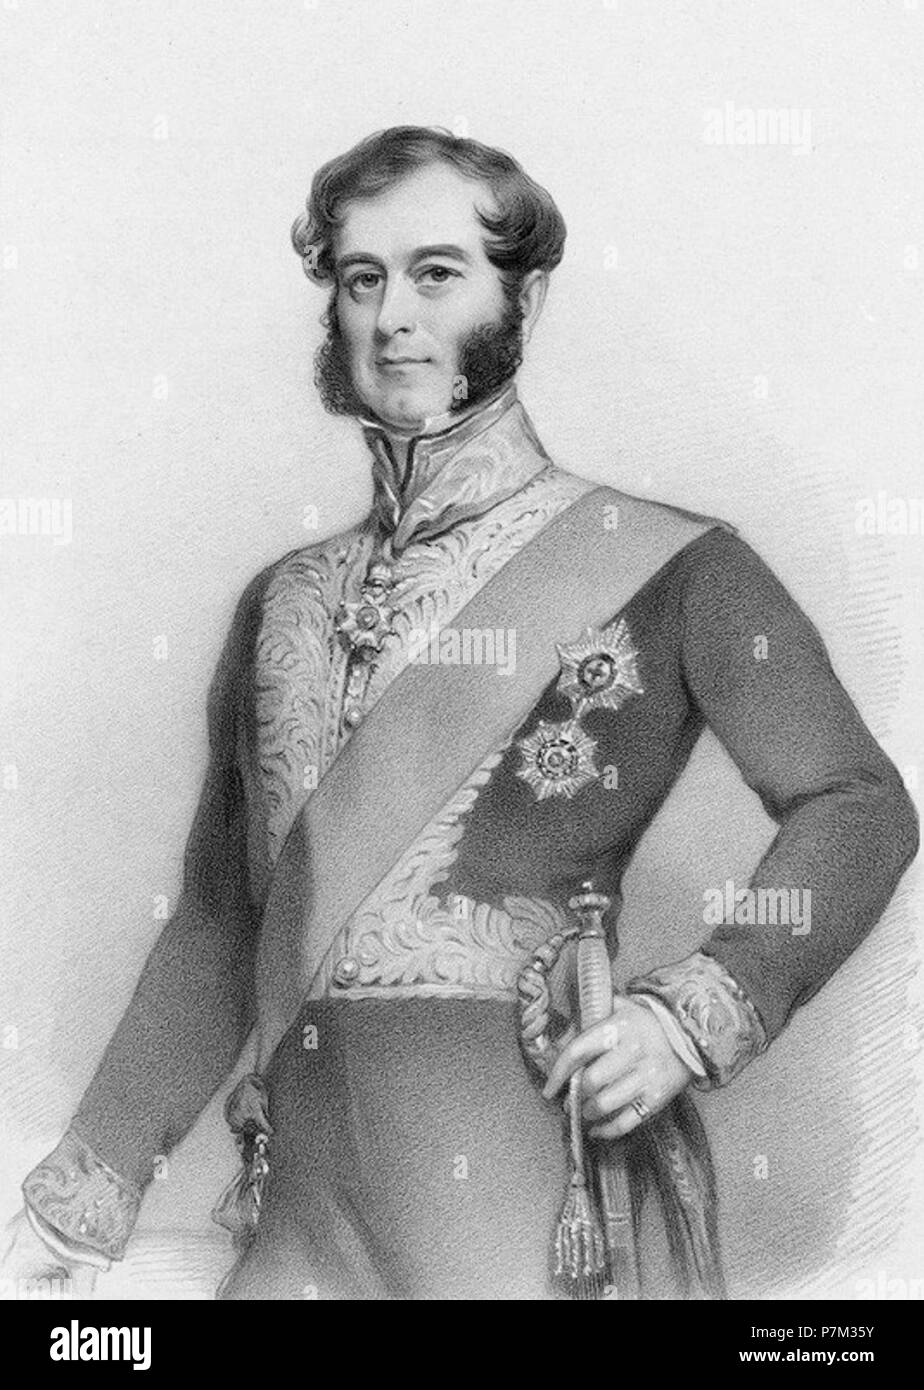 2nd  Duke of BuckinghamAndChandos. by Richard James Lane, lithograph, circa 1825-1850 - Stock Image